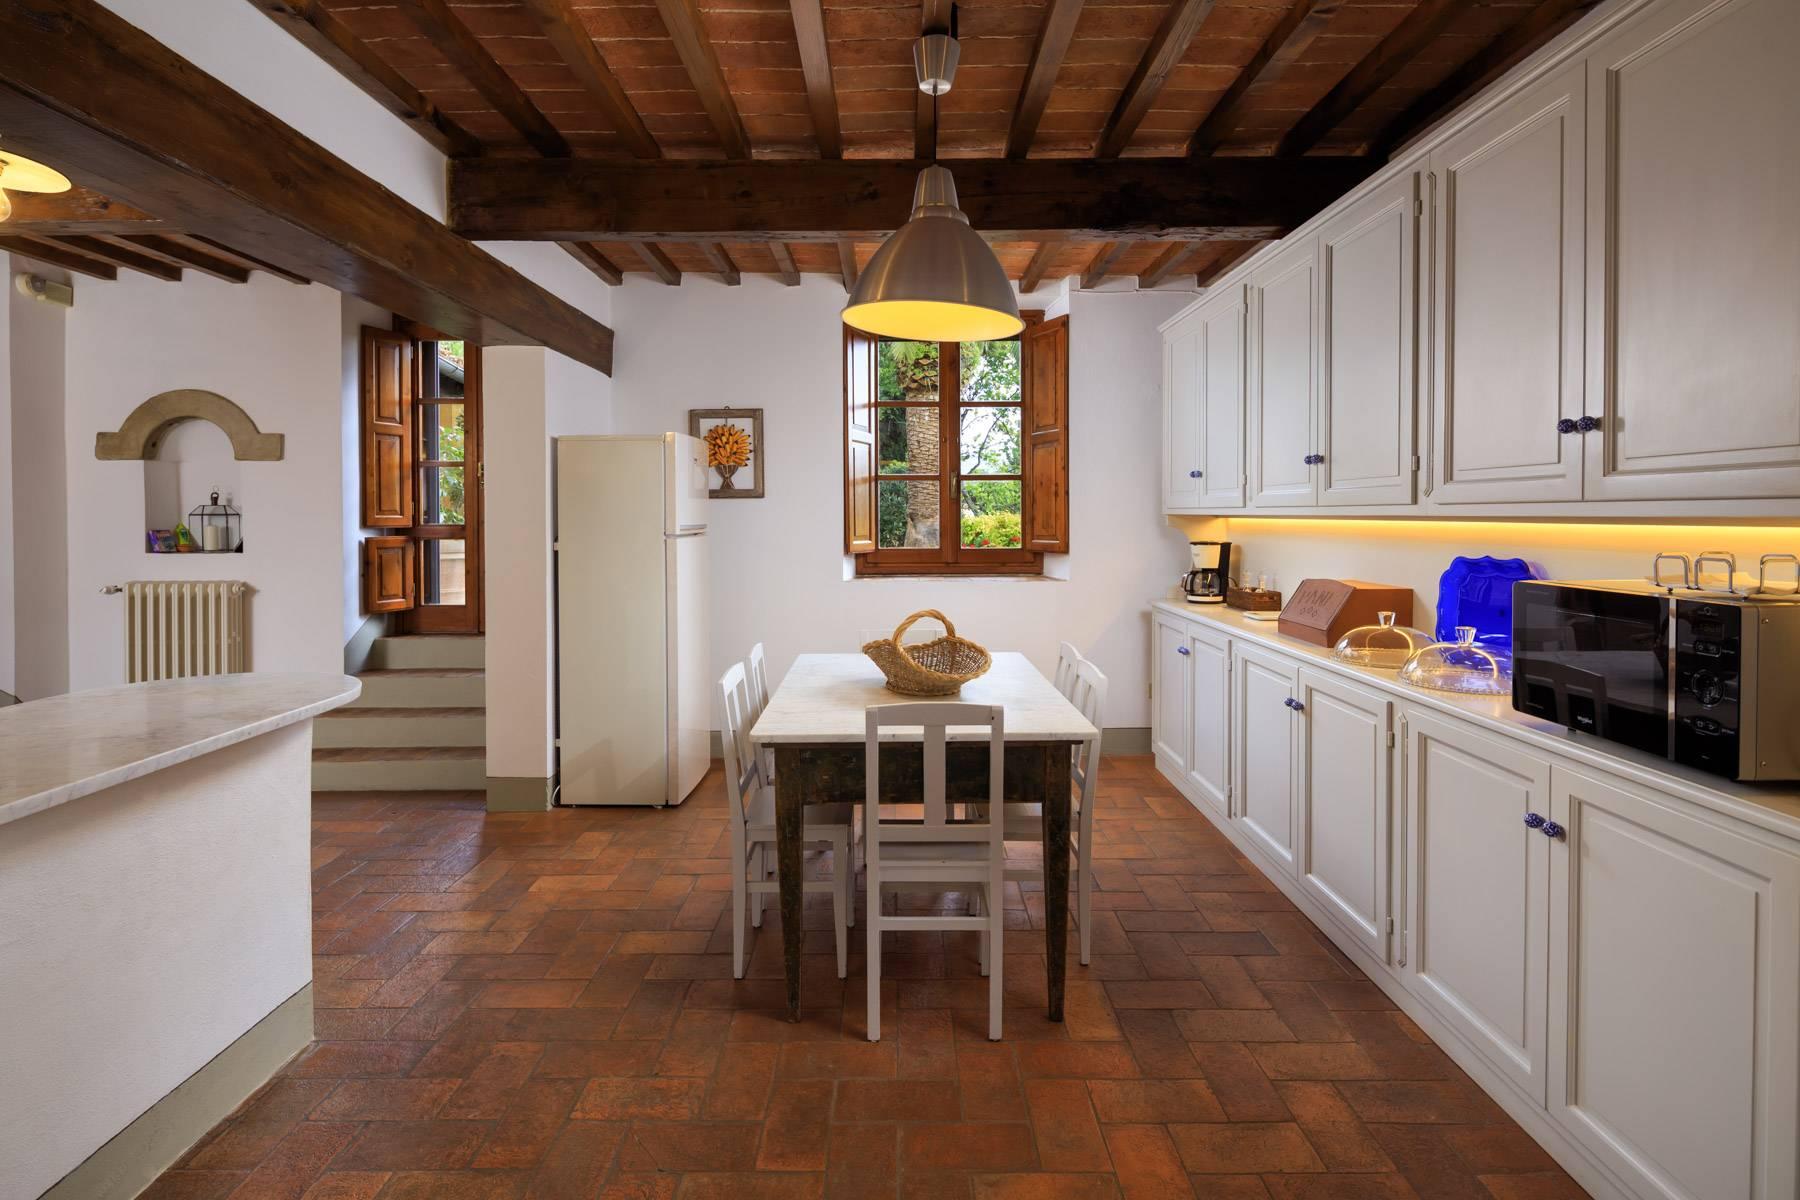 Villa in Affitto a Firenze: 5 locali, 600 mq - Foto 18